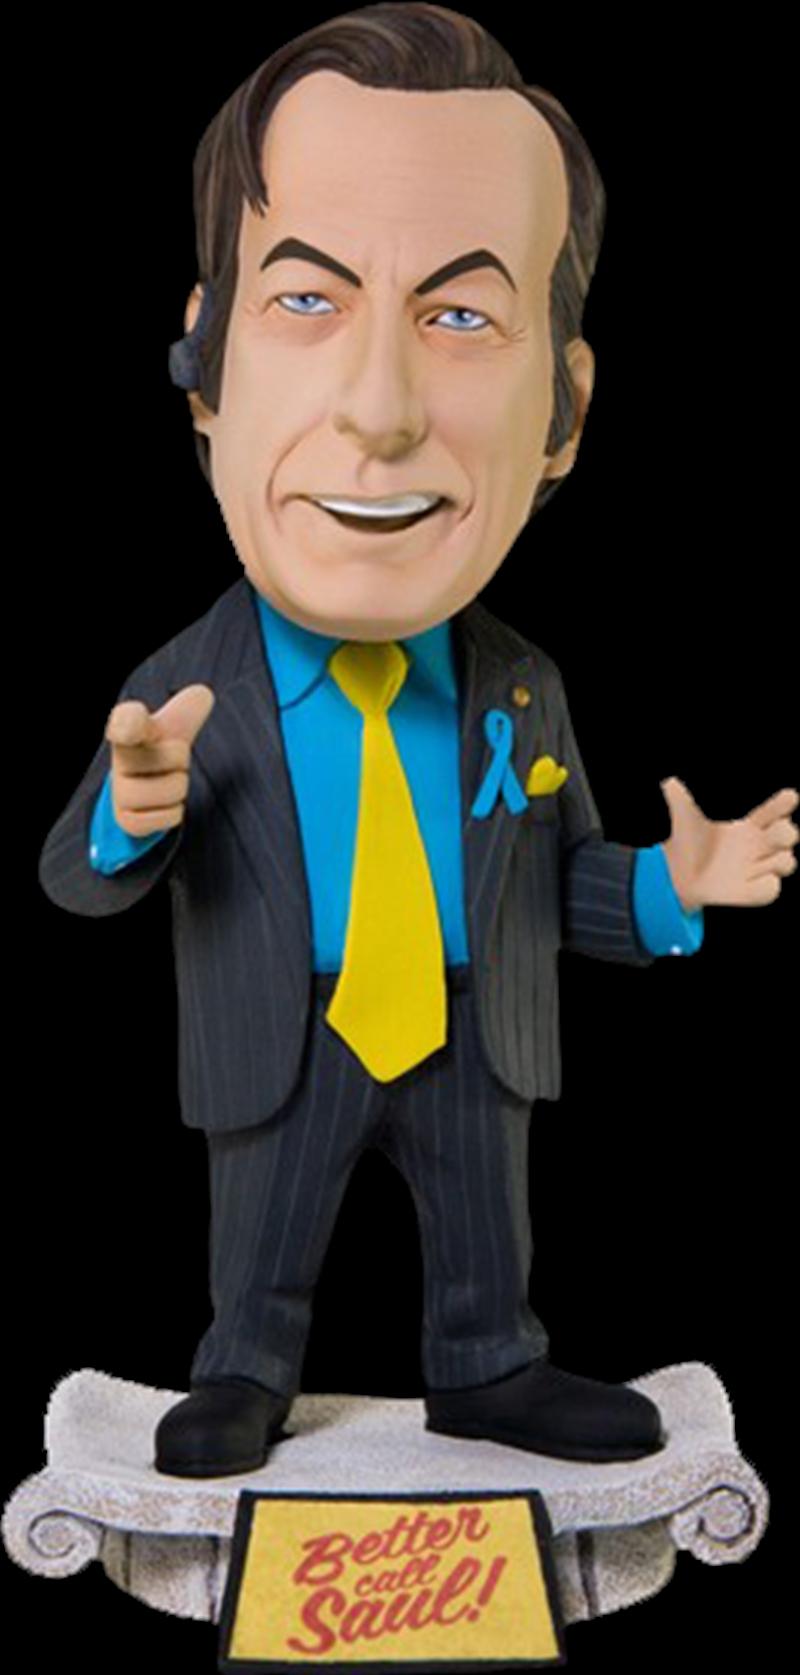 Breaking Bad - Saul Goodman Bobble Head | Merchandise